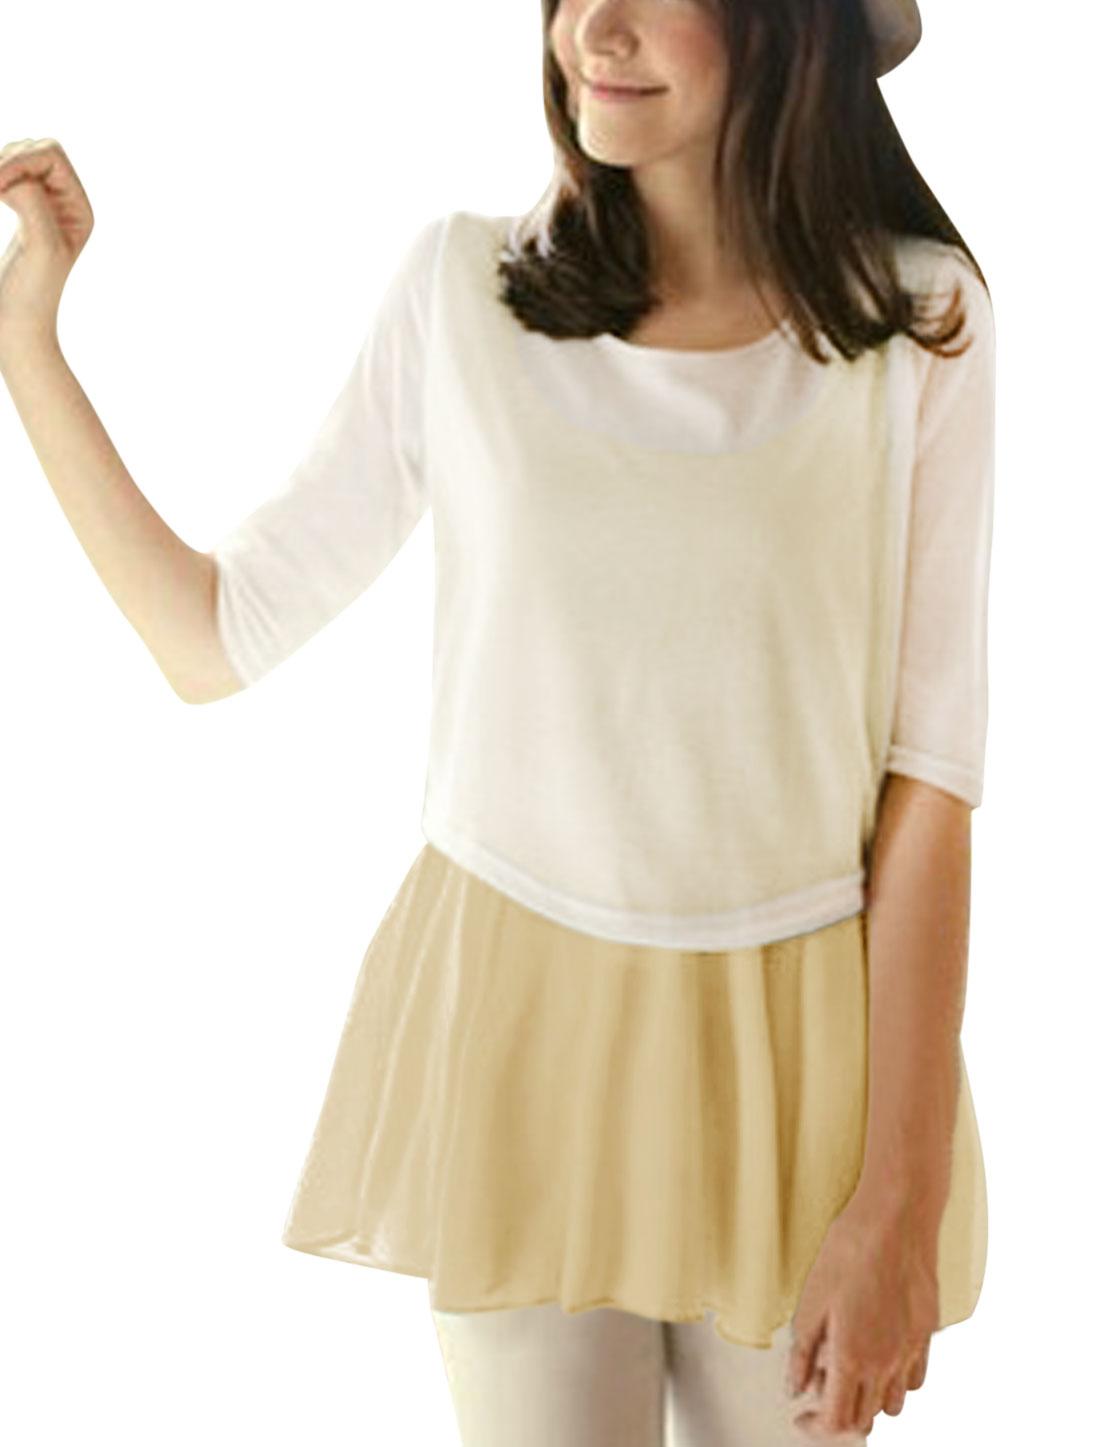 Lady 3/4 Sleeve Knit Top w Semi Sheer Tunic Top Dark Khaki S